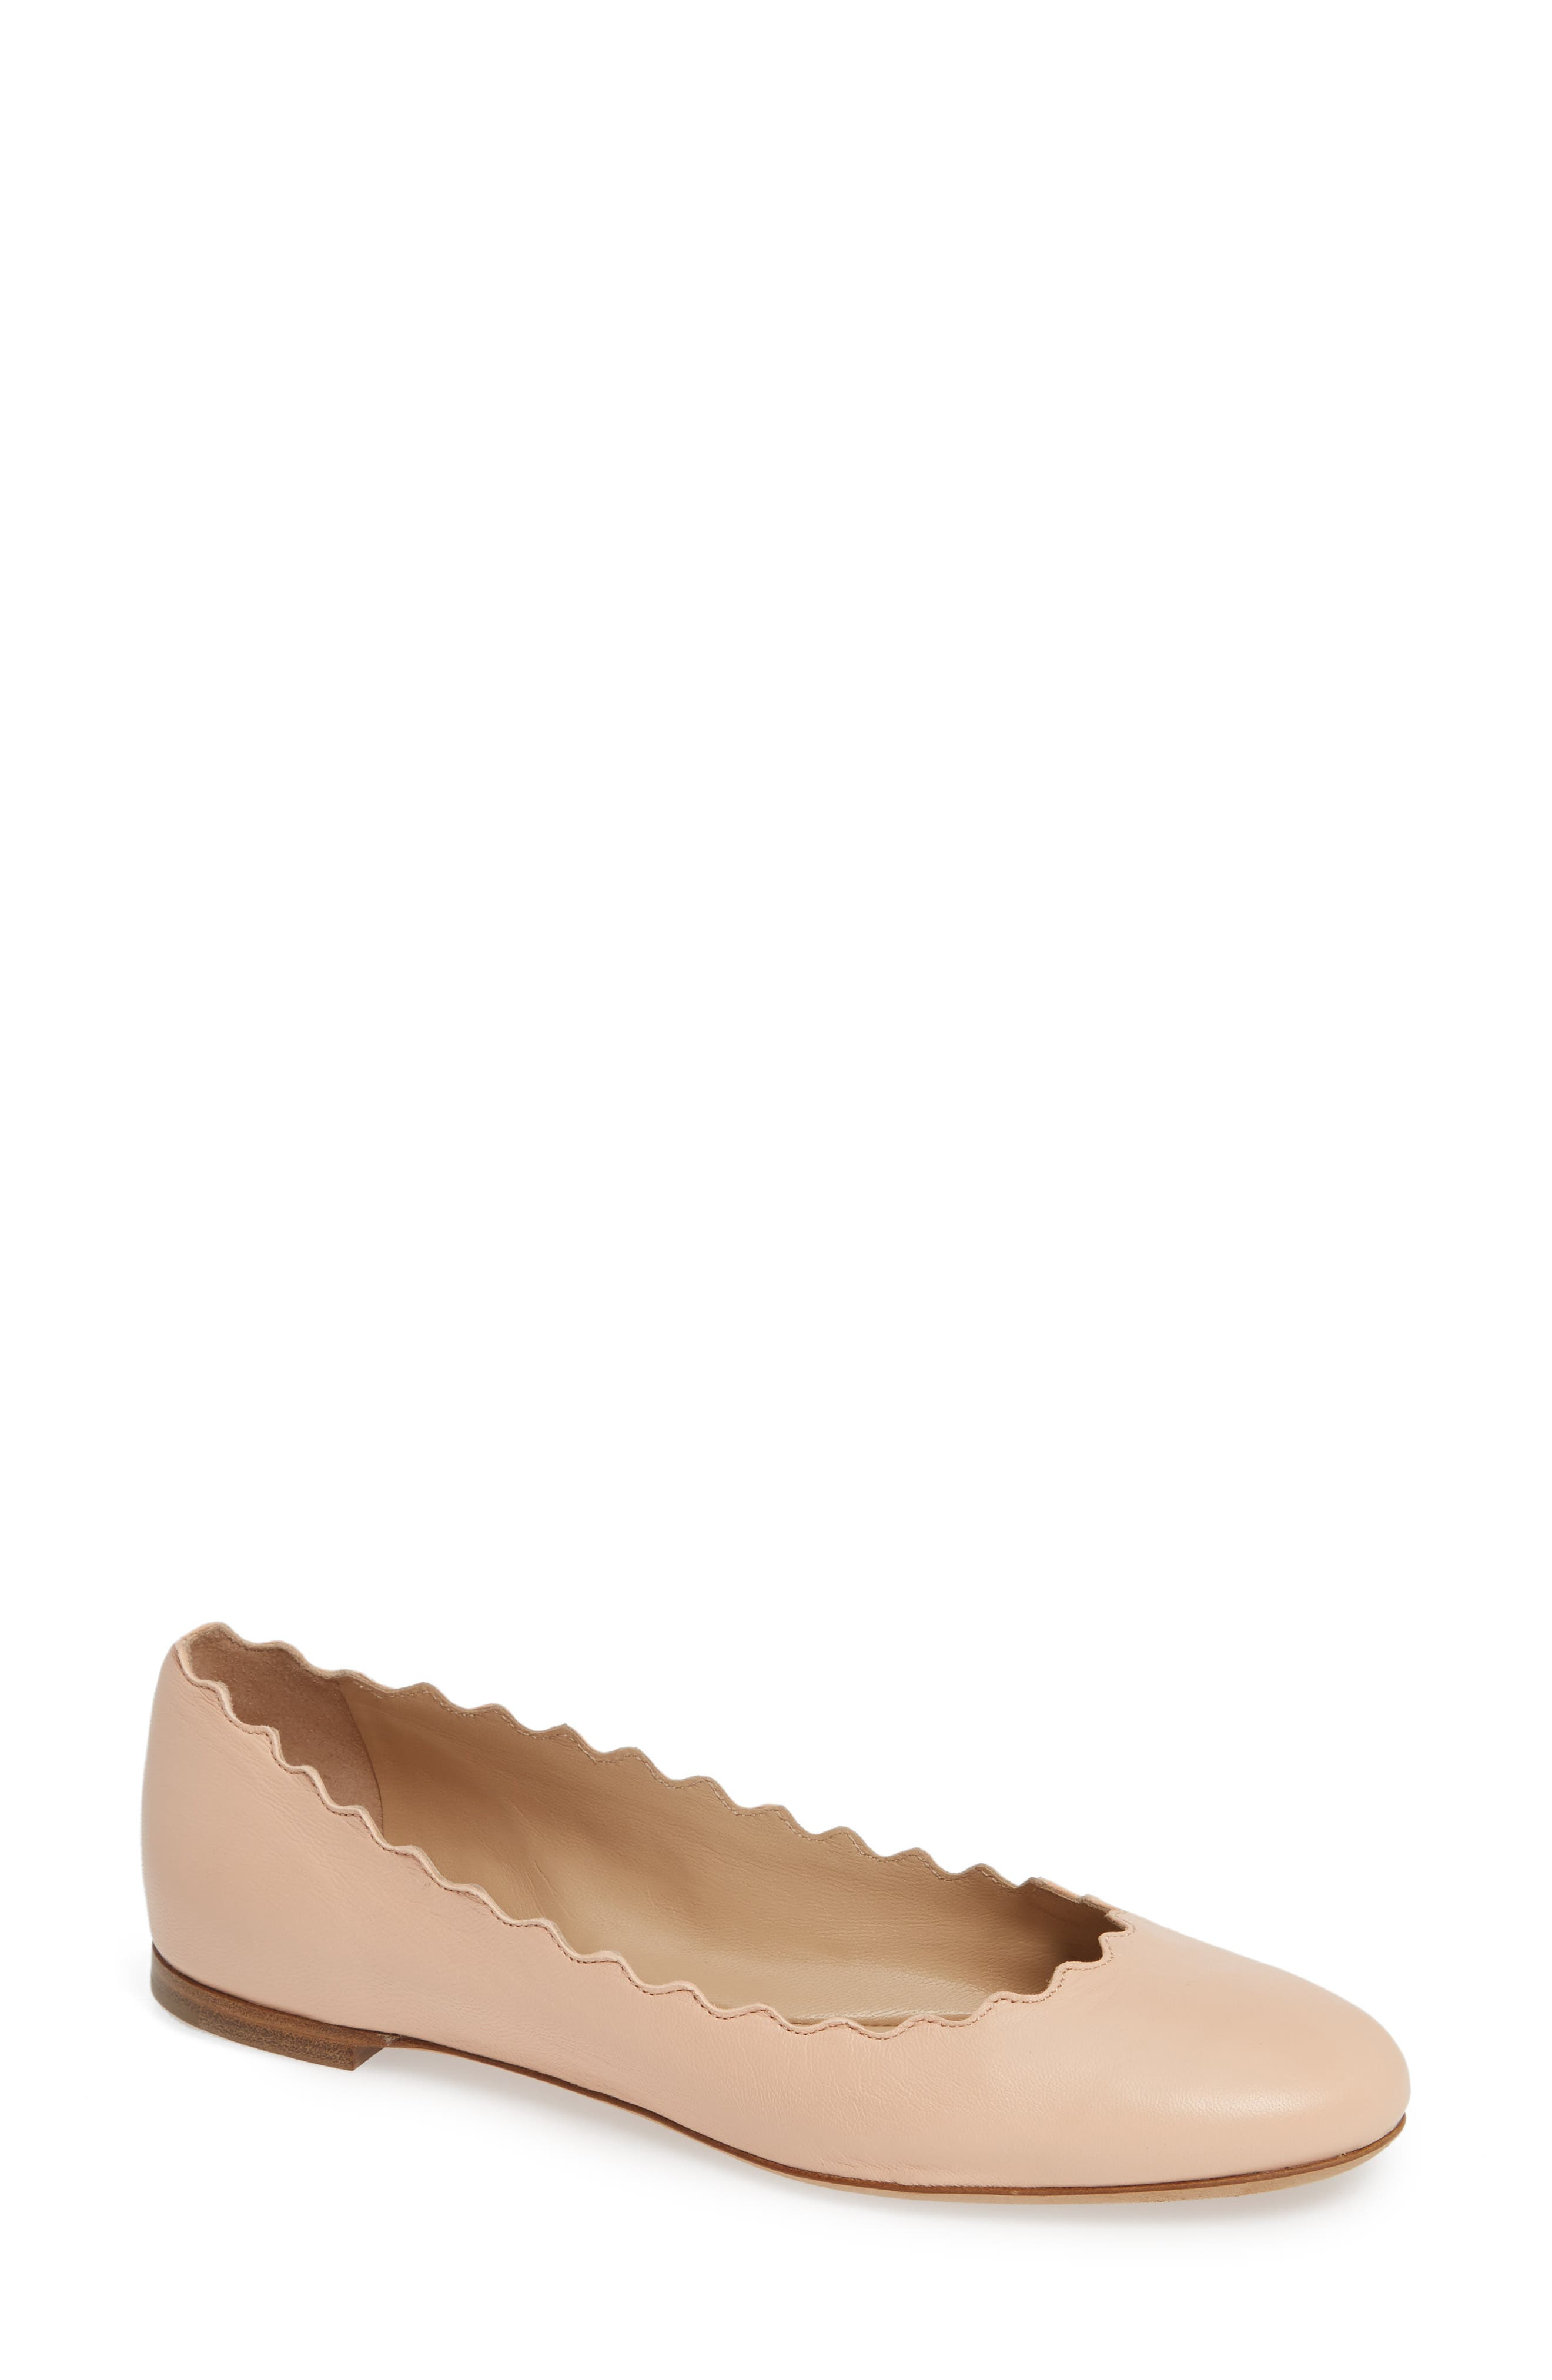 'Lauren' Scalloped Ballet Flat,                         Main,                         color, DELICATE PINK LEATHER